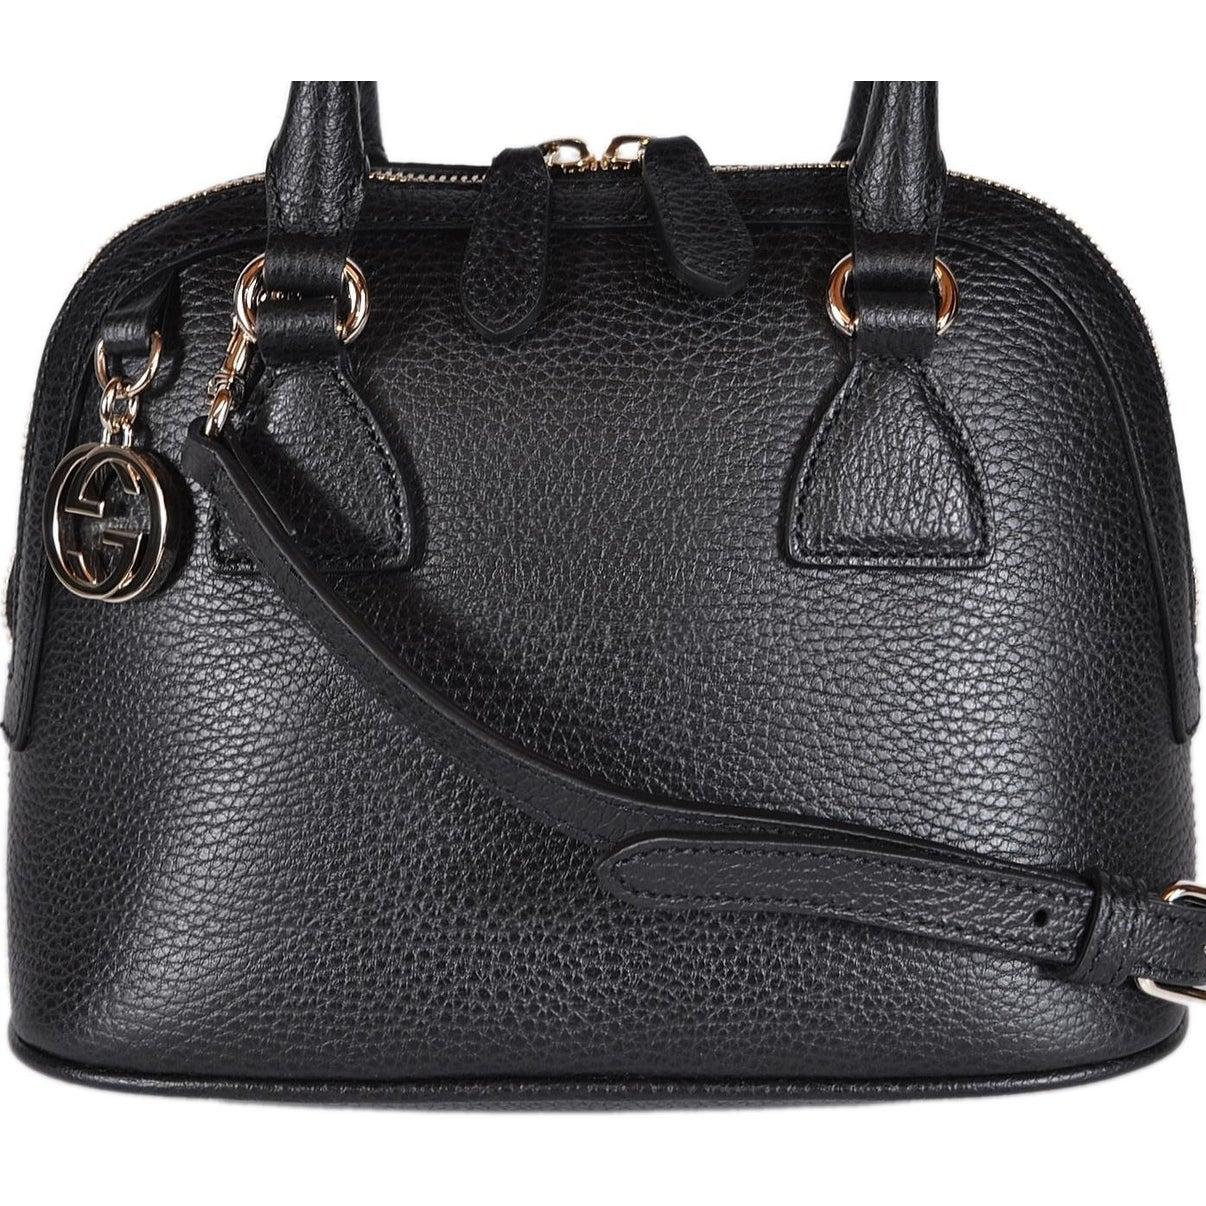 21c223c88 Shop Gucci 449661 Black Leather 2-Way Convertible GG Charm Small Dome Purse  - 9.06